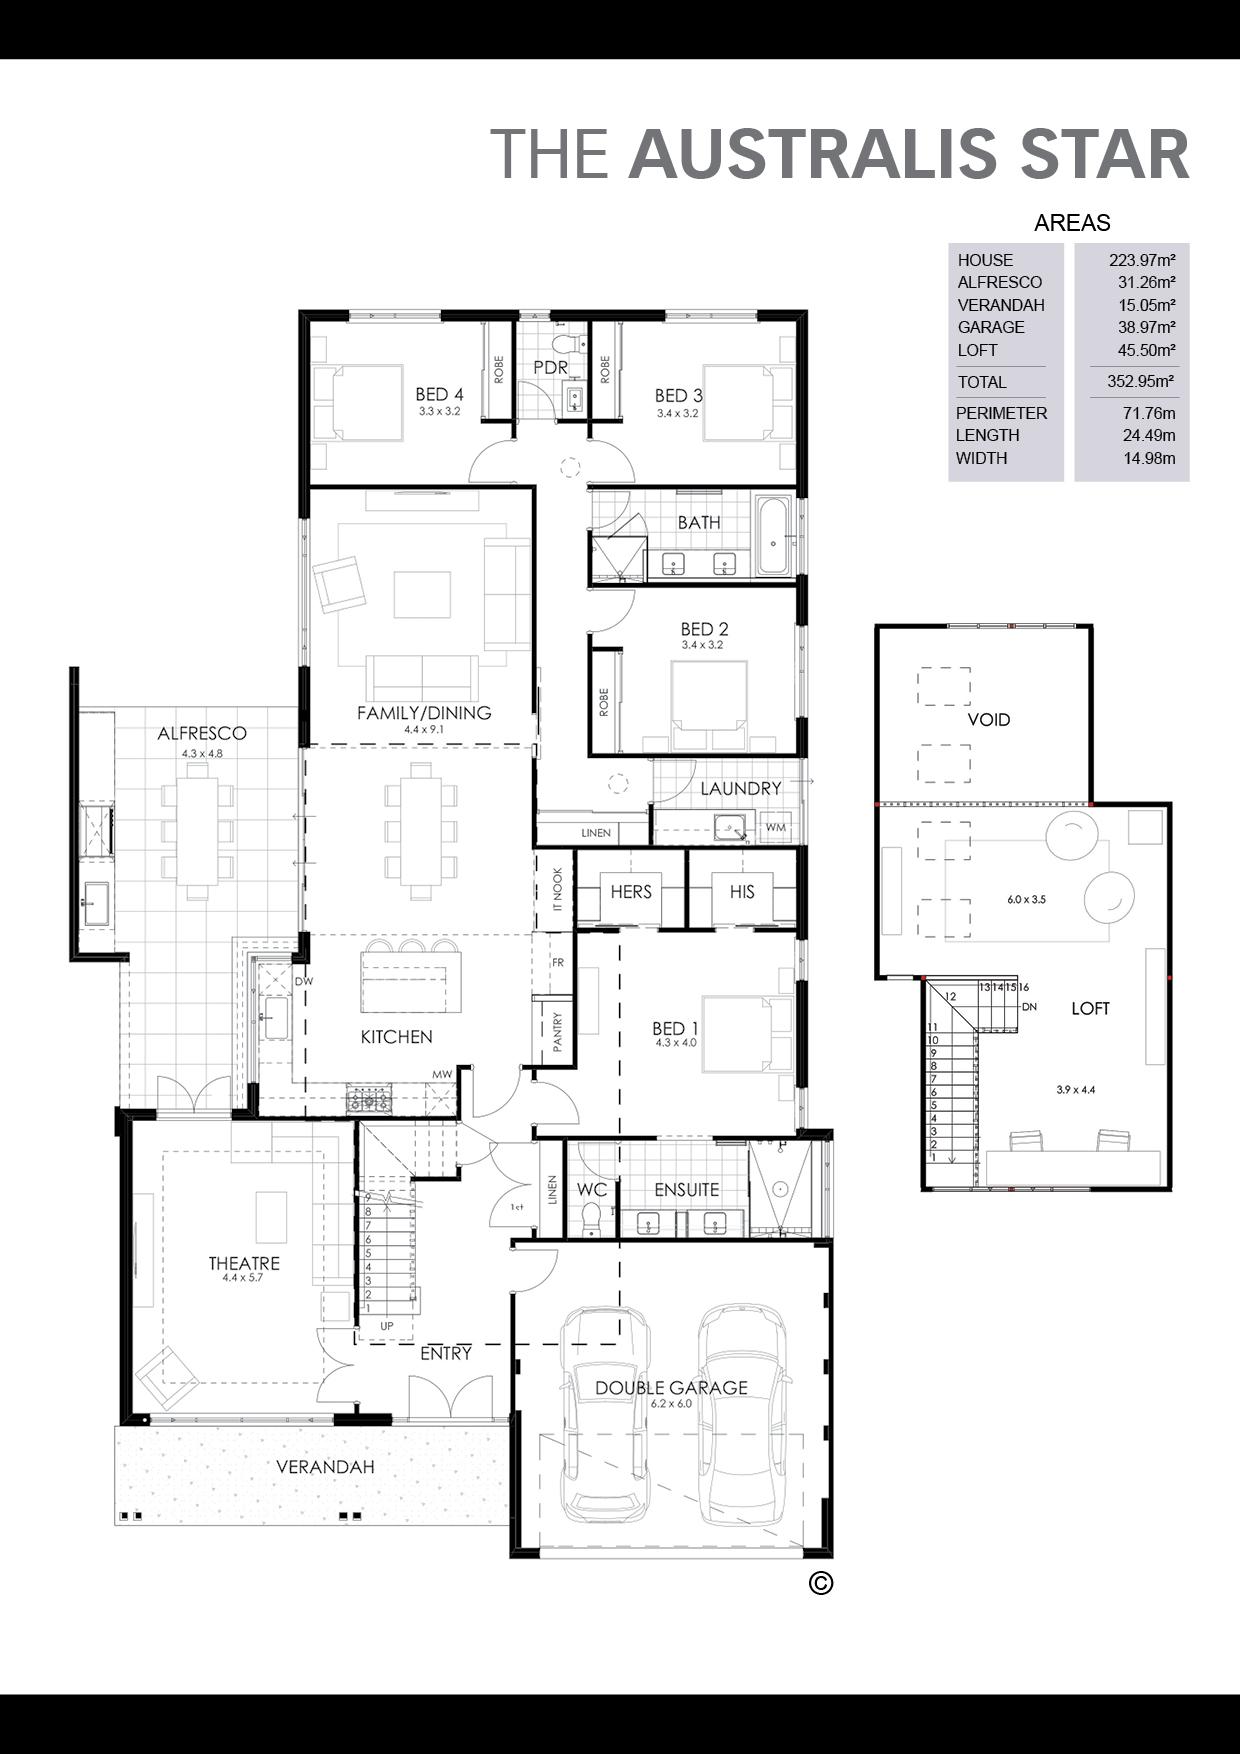 The Australis Star Floorplan